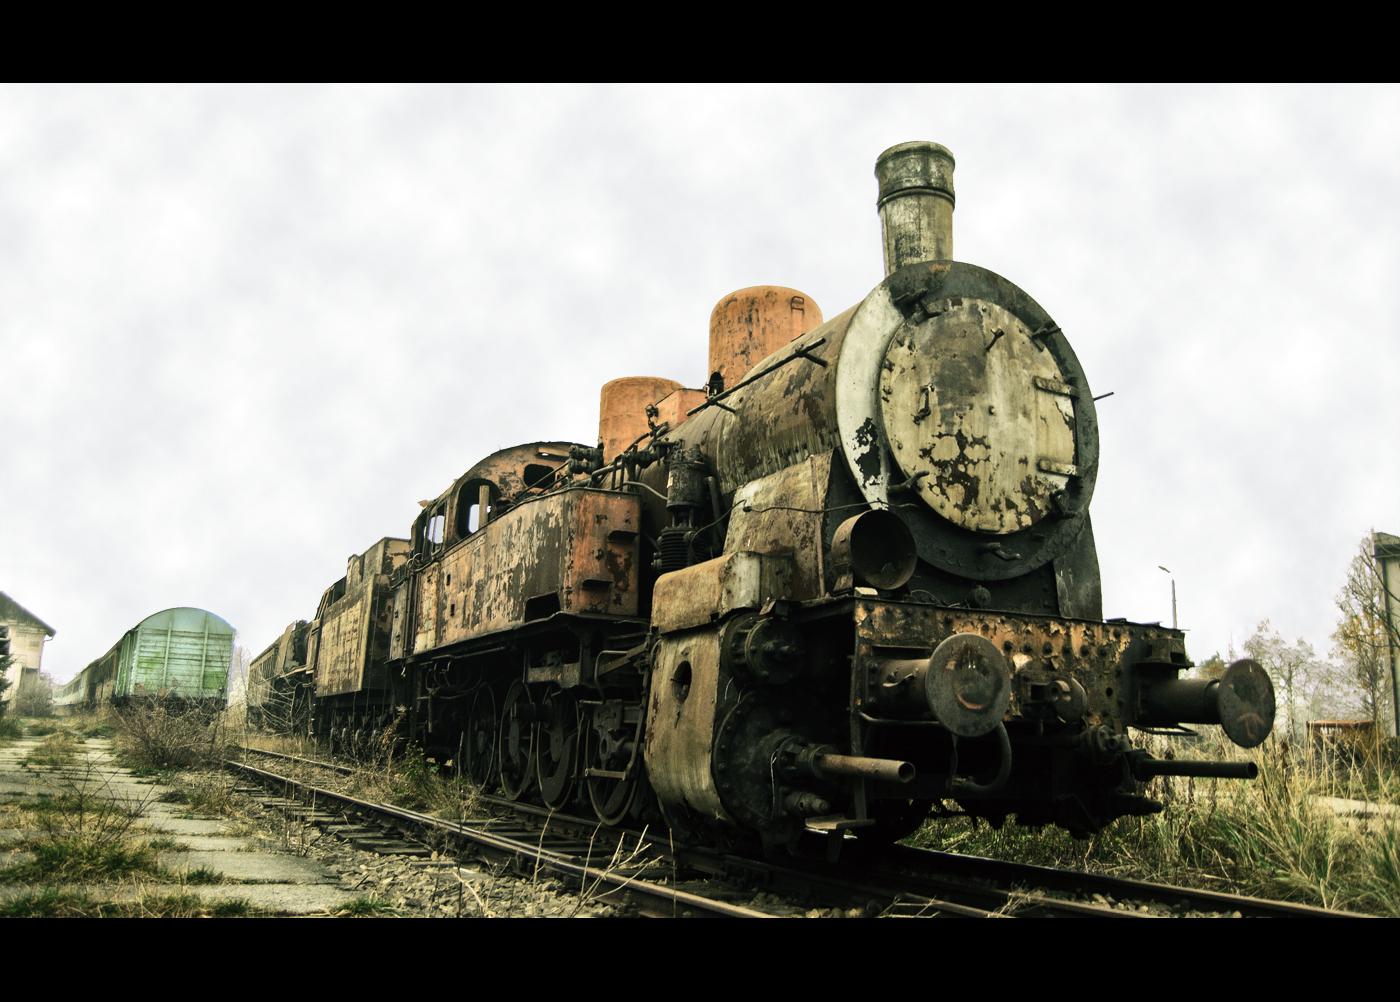 Big Bad Locomotive by Beezqp